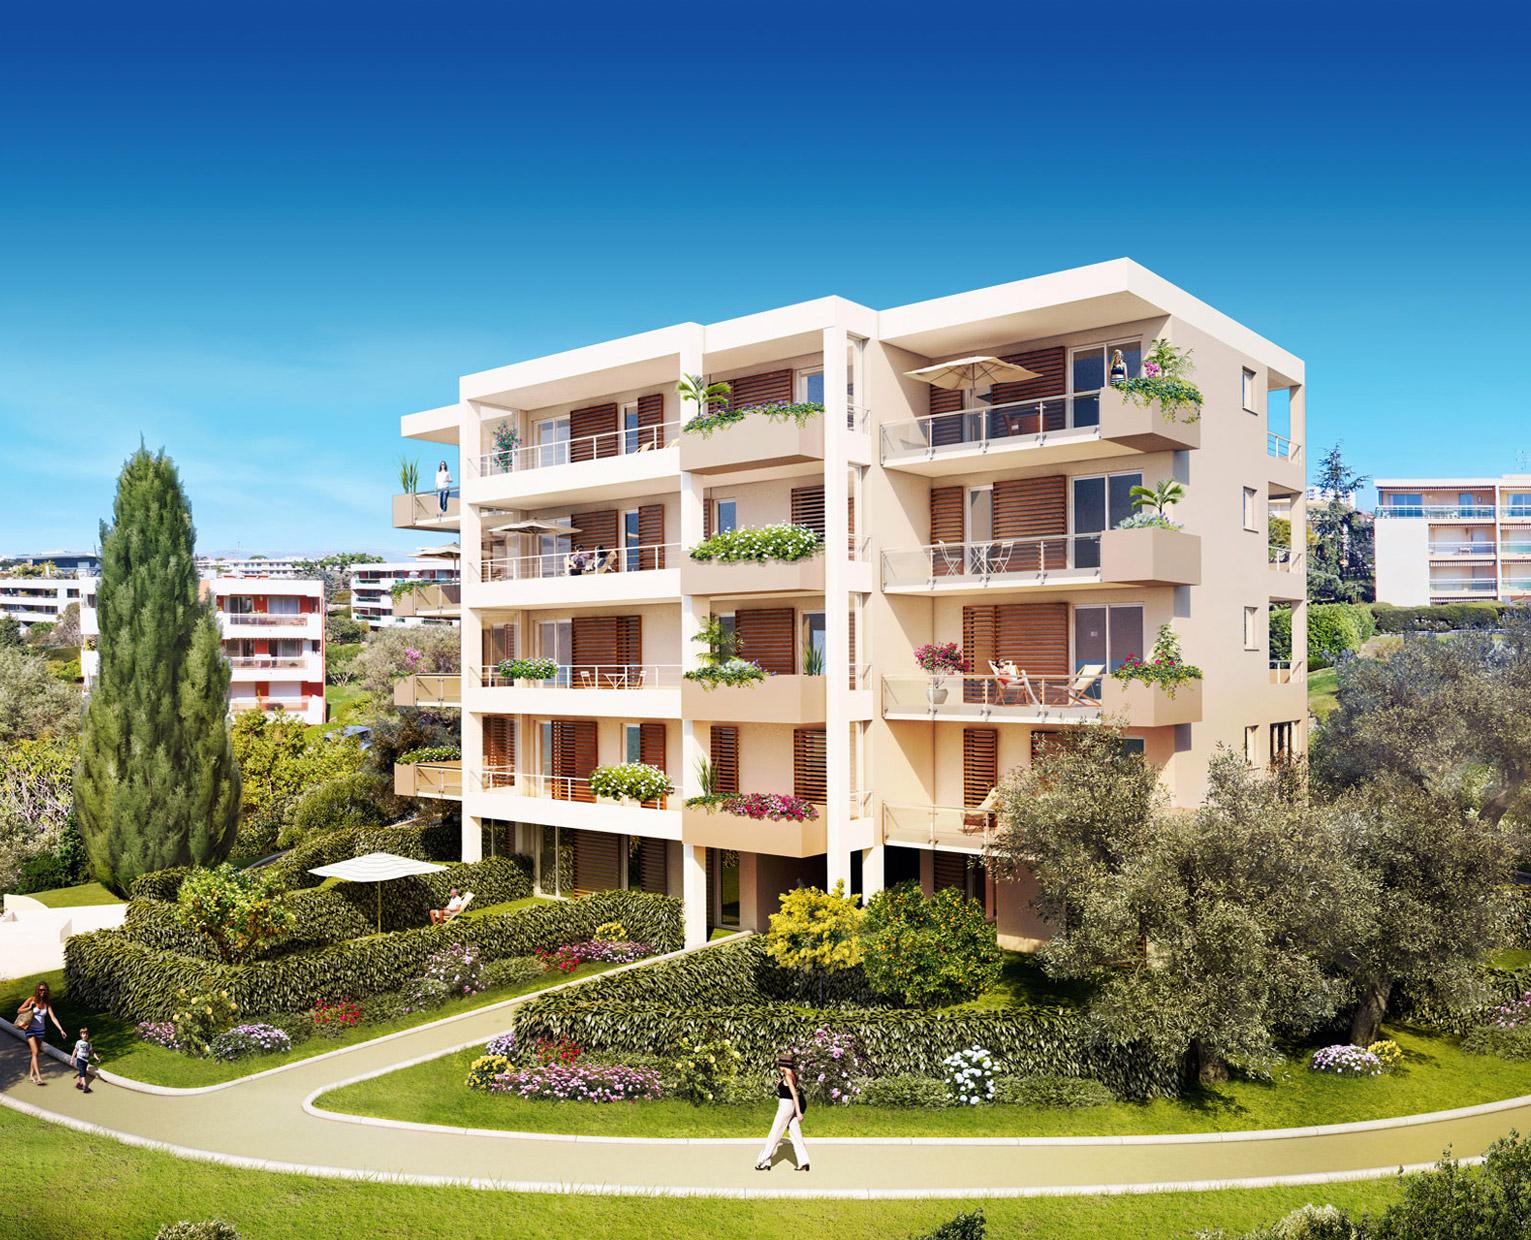 Programme Immobilier Antibes Le Clos Des Blanquetiers